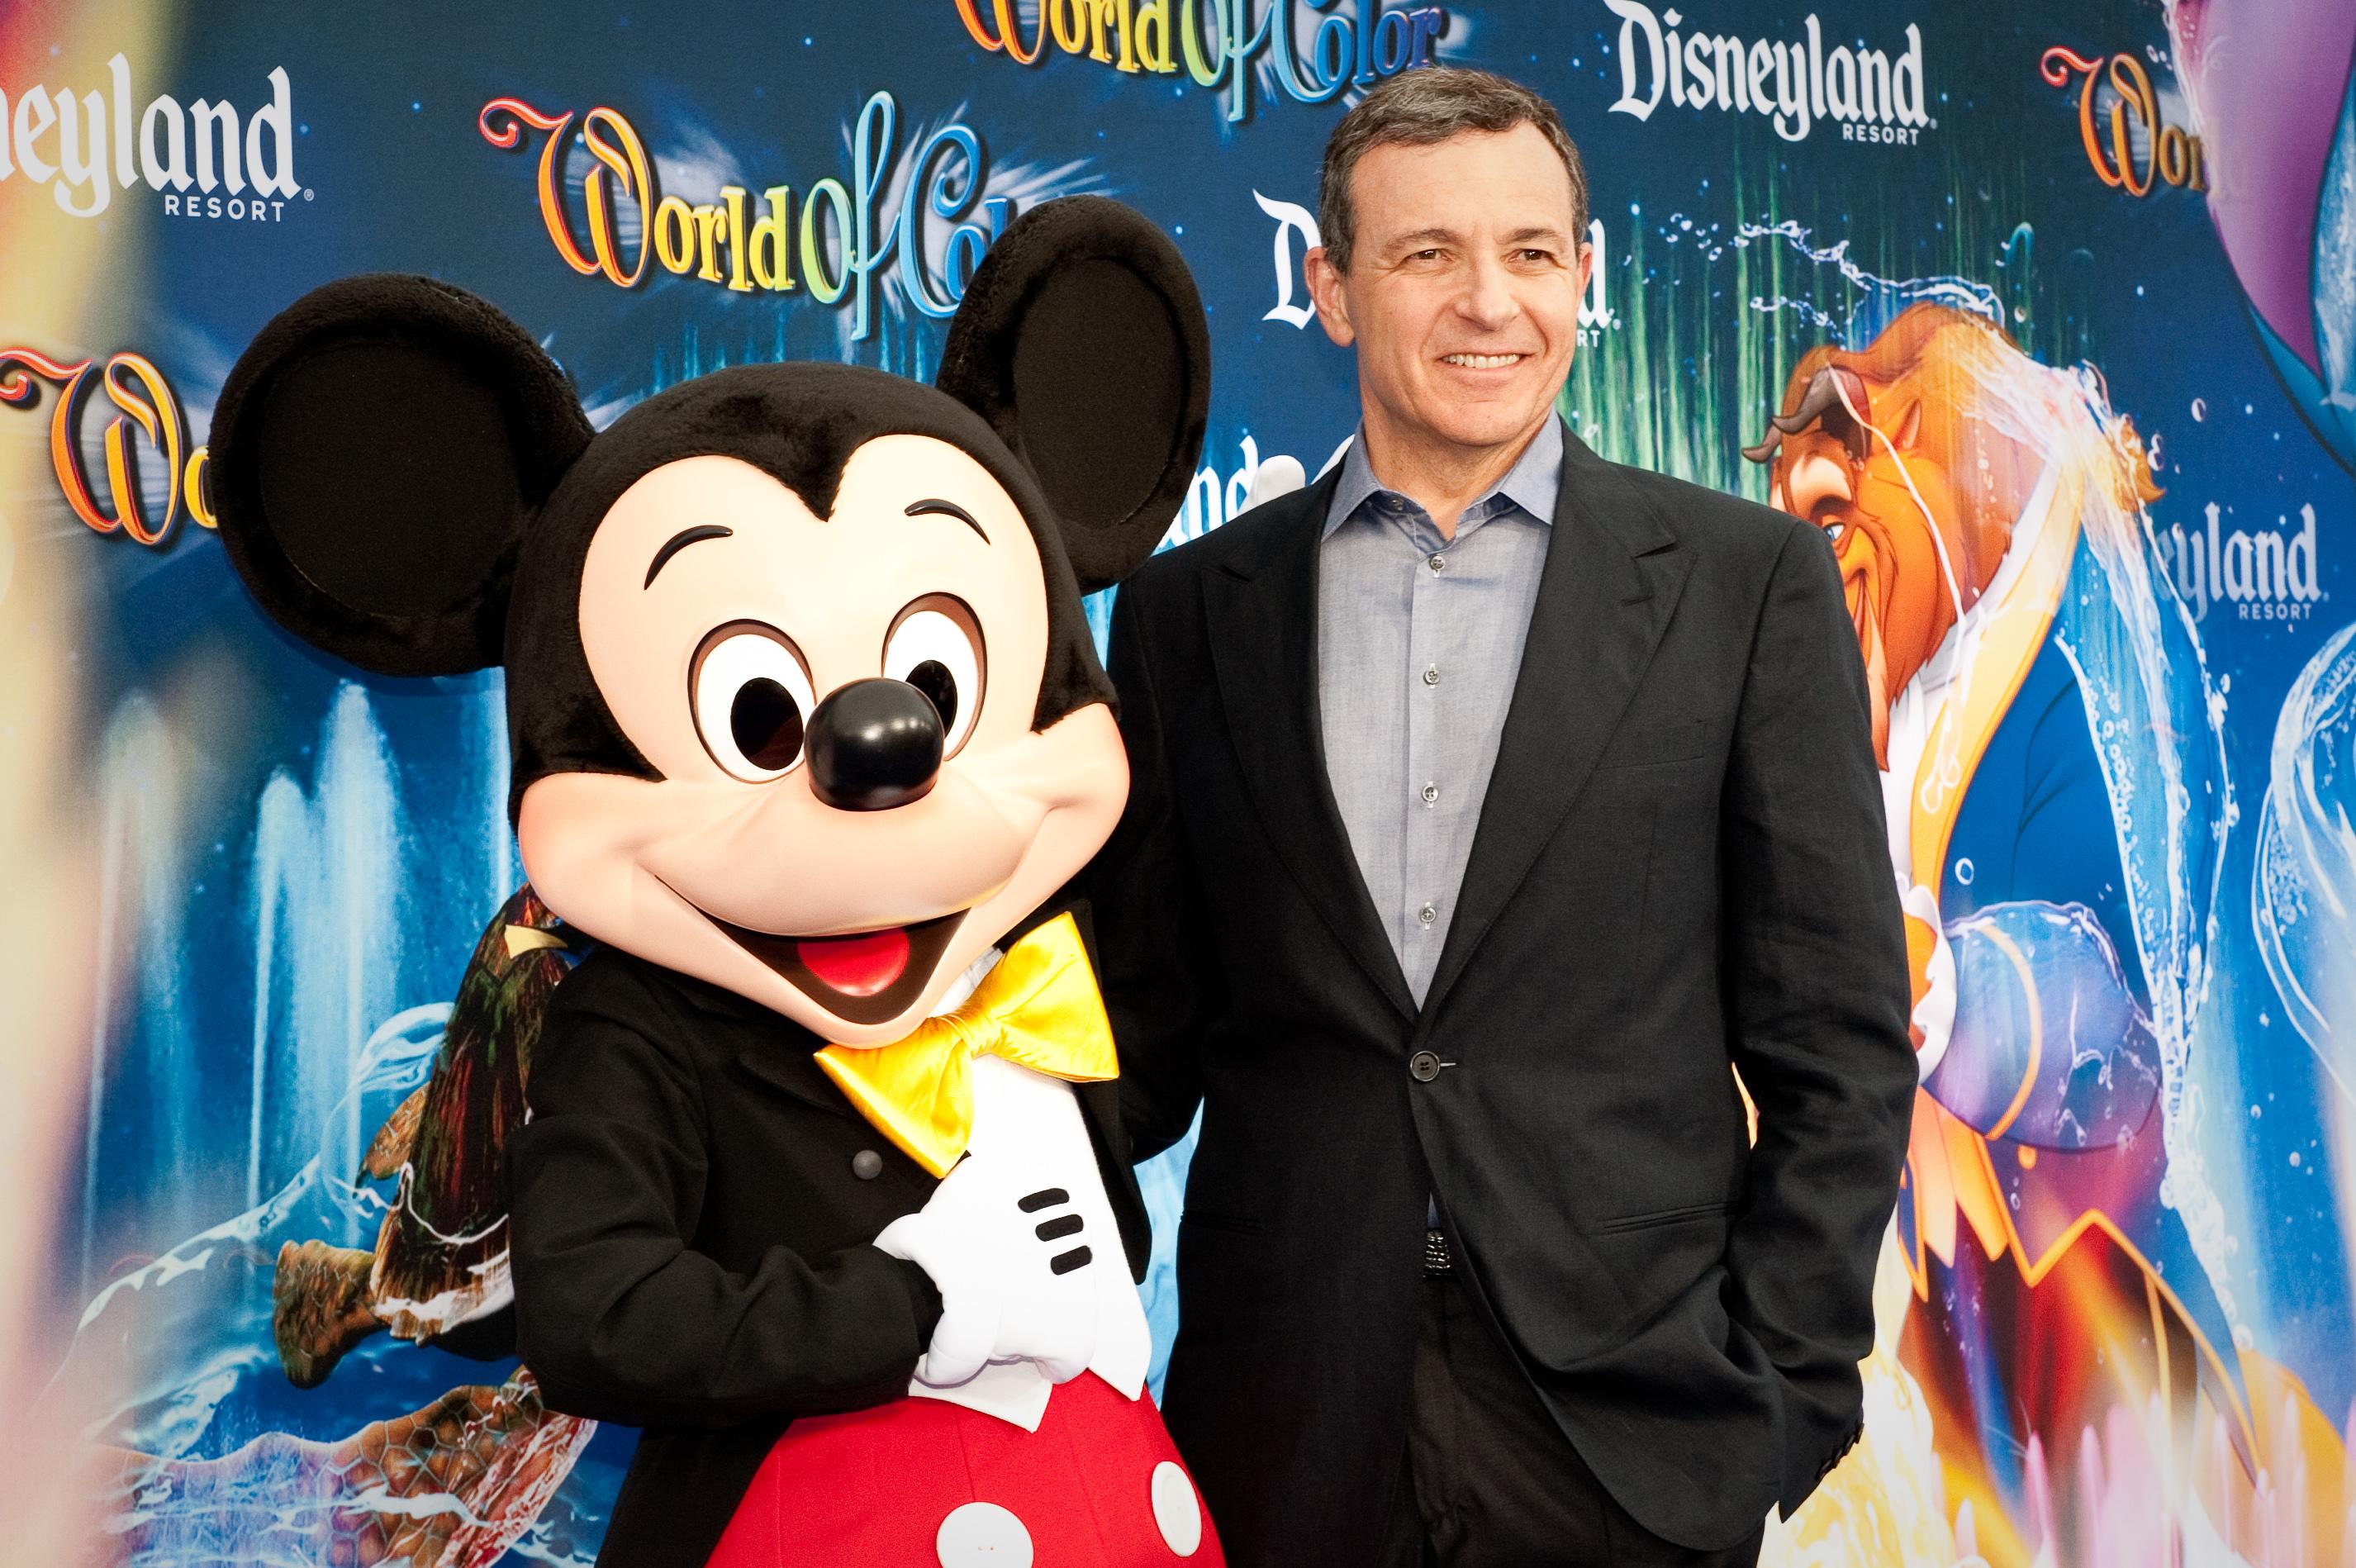 Iger Confirms Disney's Plans to Continue Marvel/Star Wars Franchises